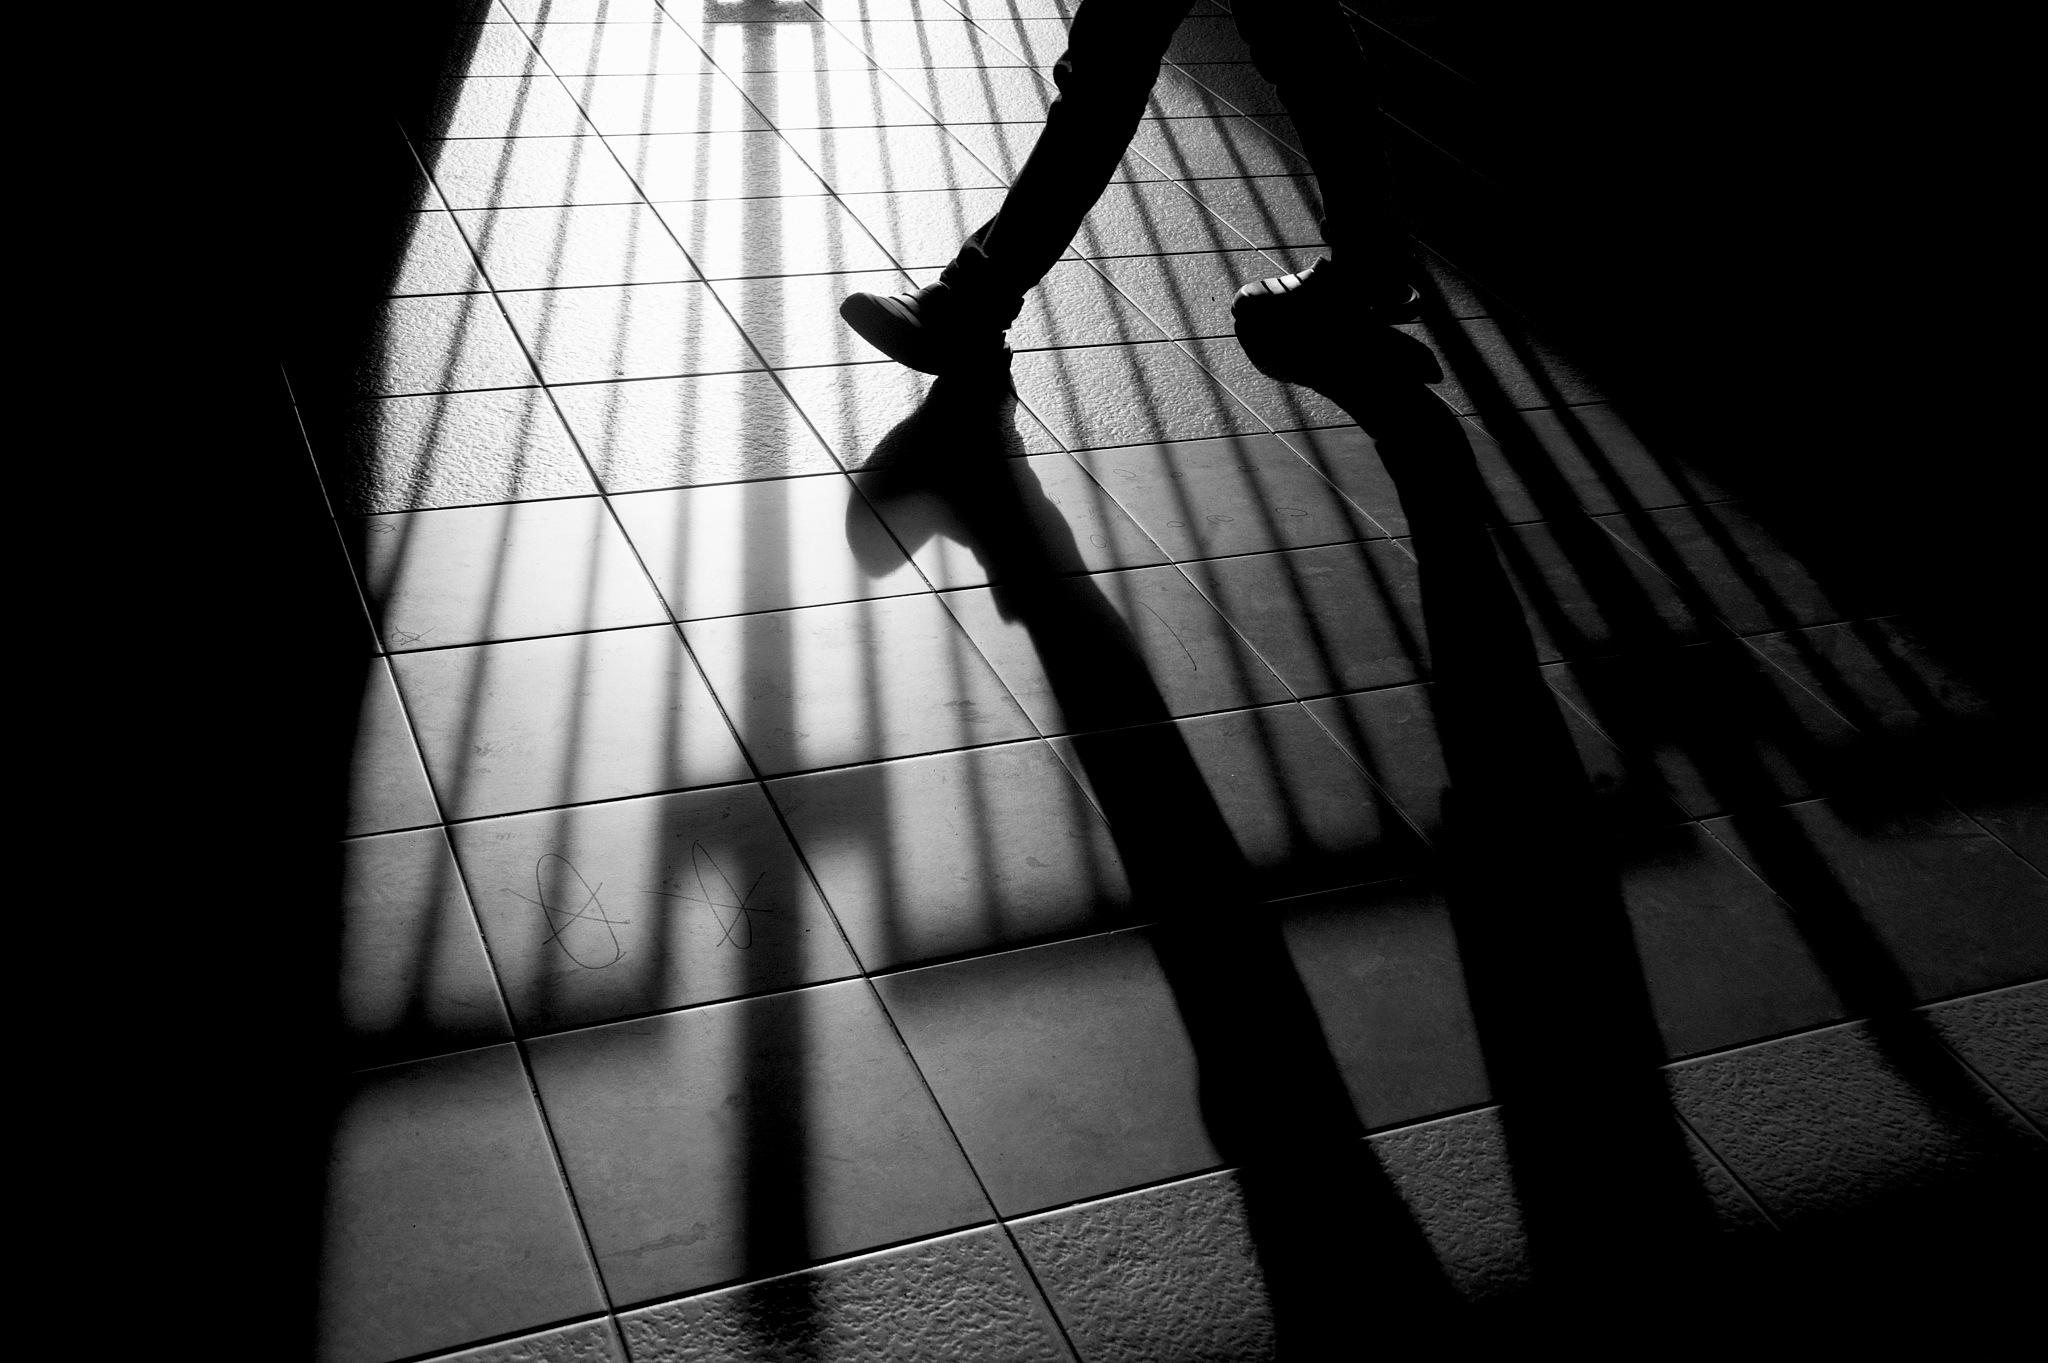 shoot the street in black and white series by Mustaffa Tapa Otai